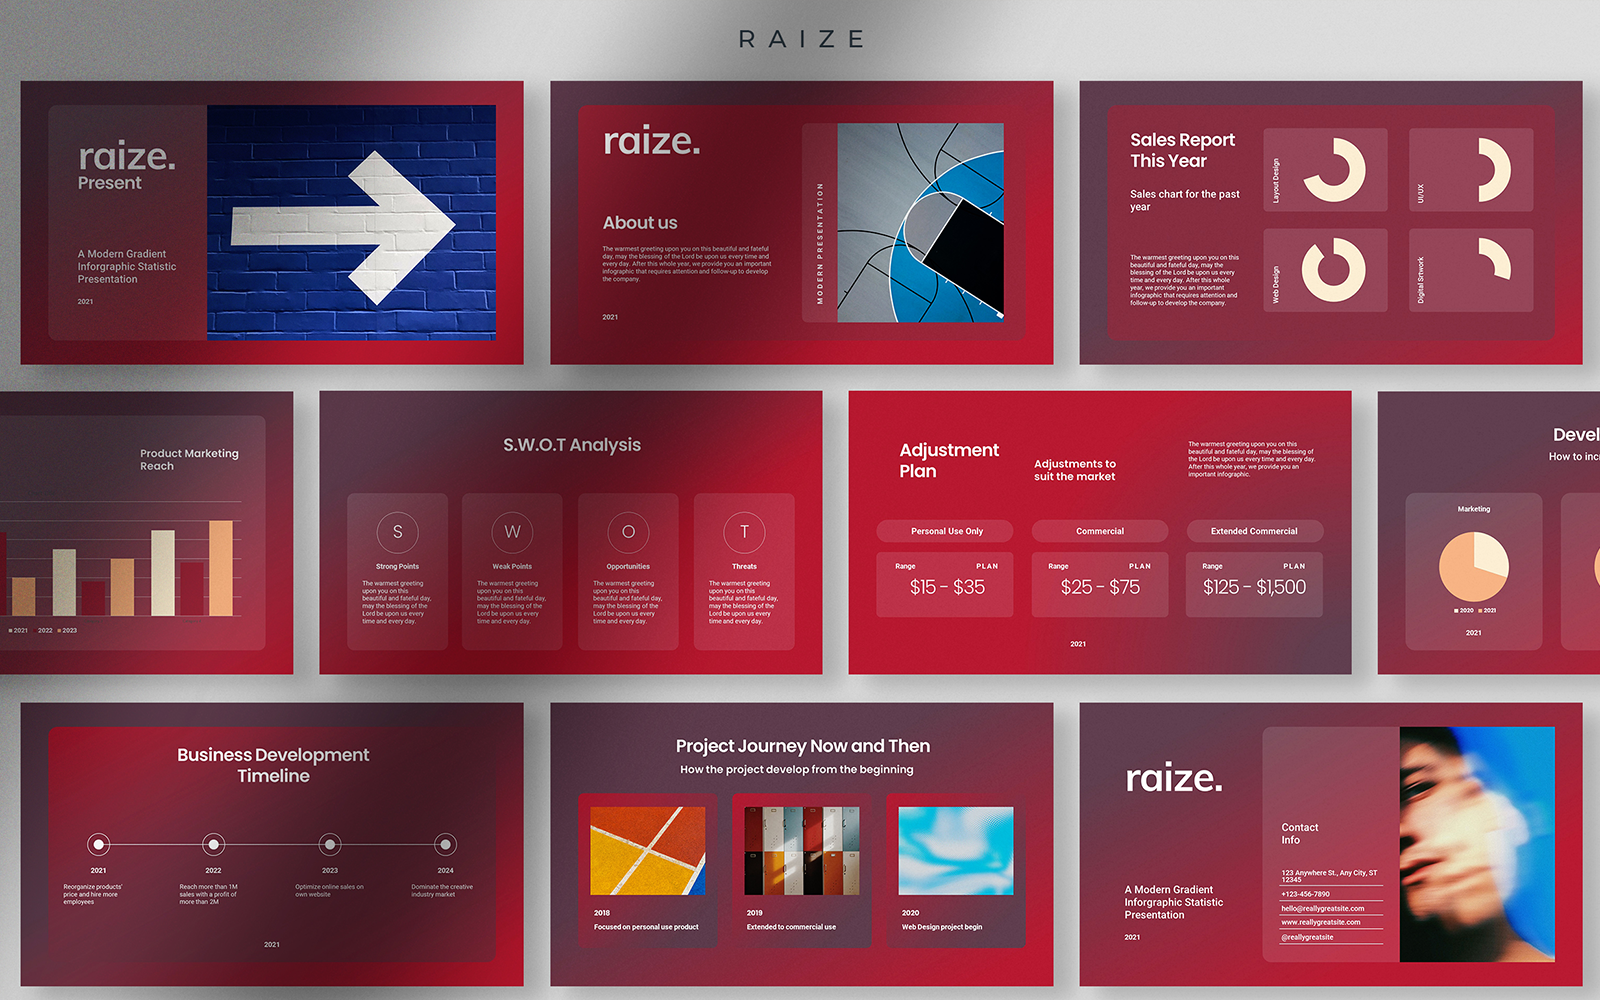 Raize - Gradient Infographic PPT